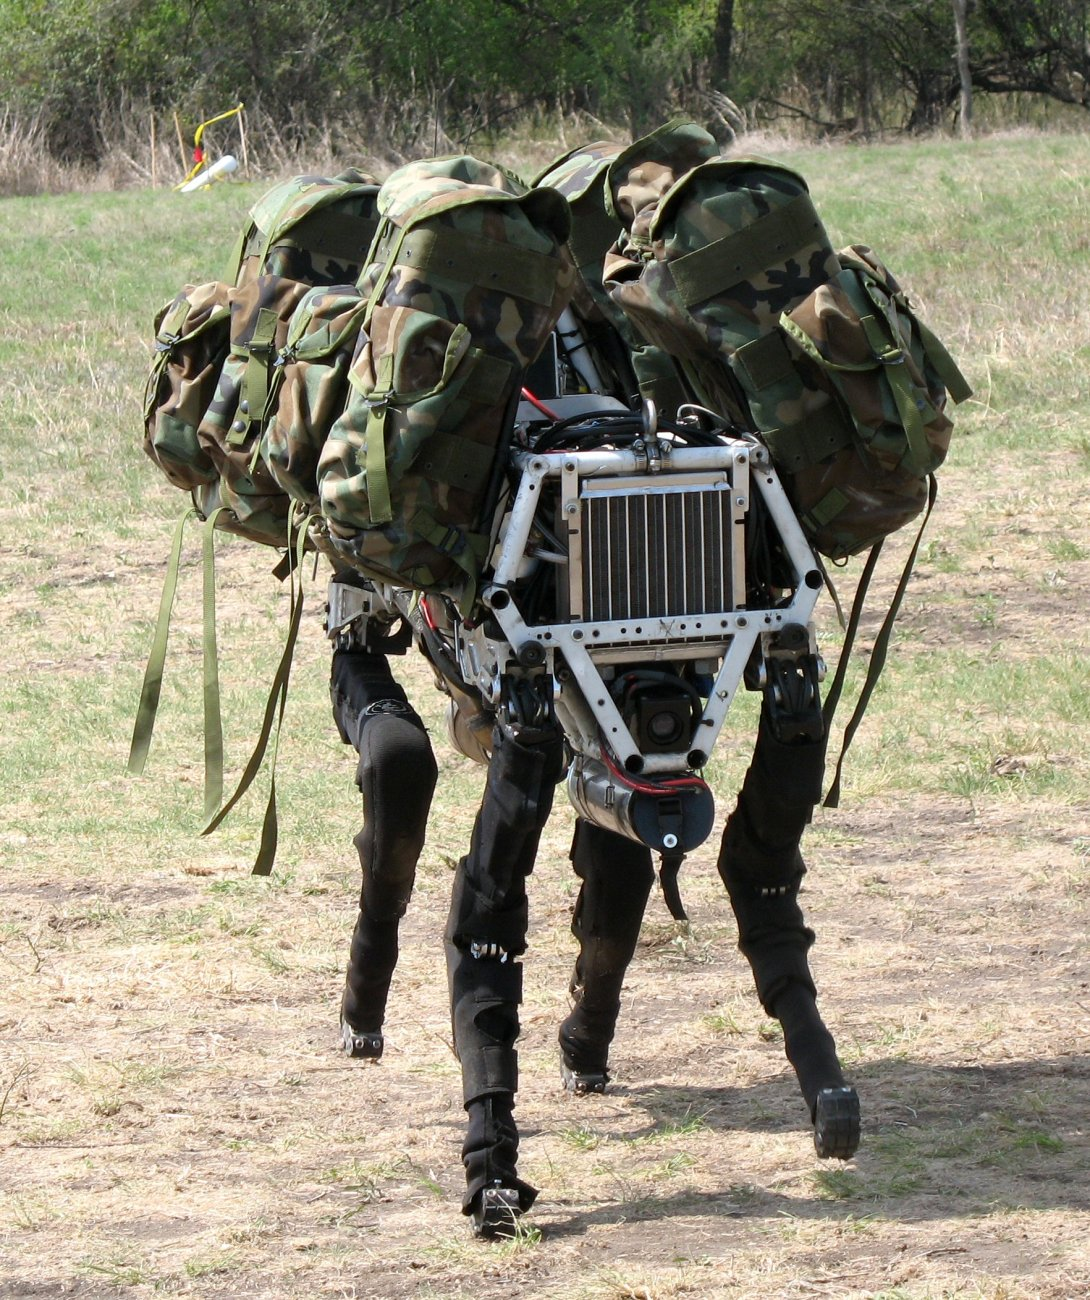 انه روبوت، مهما ترائ لك مظهره الخارجي